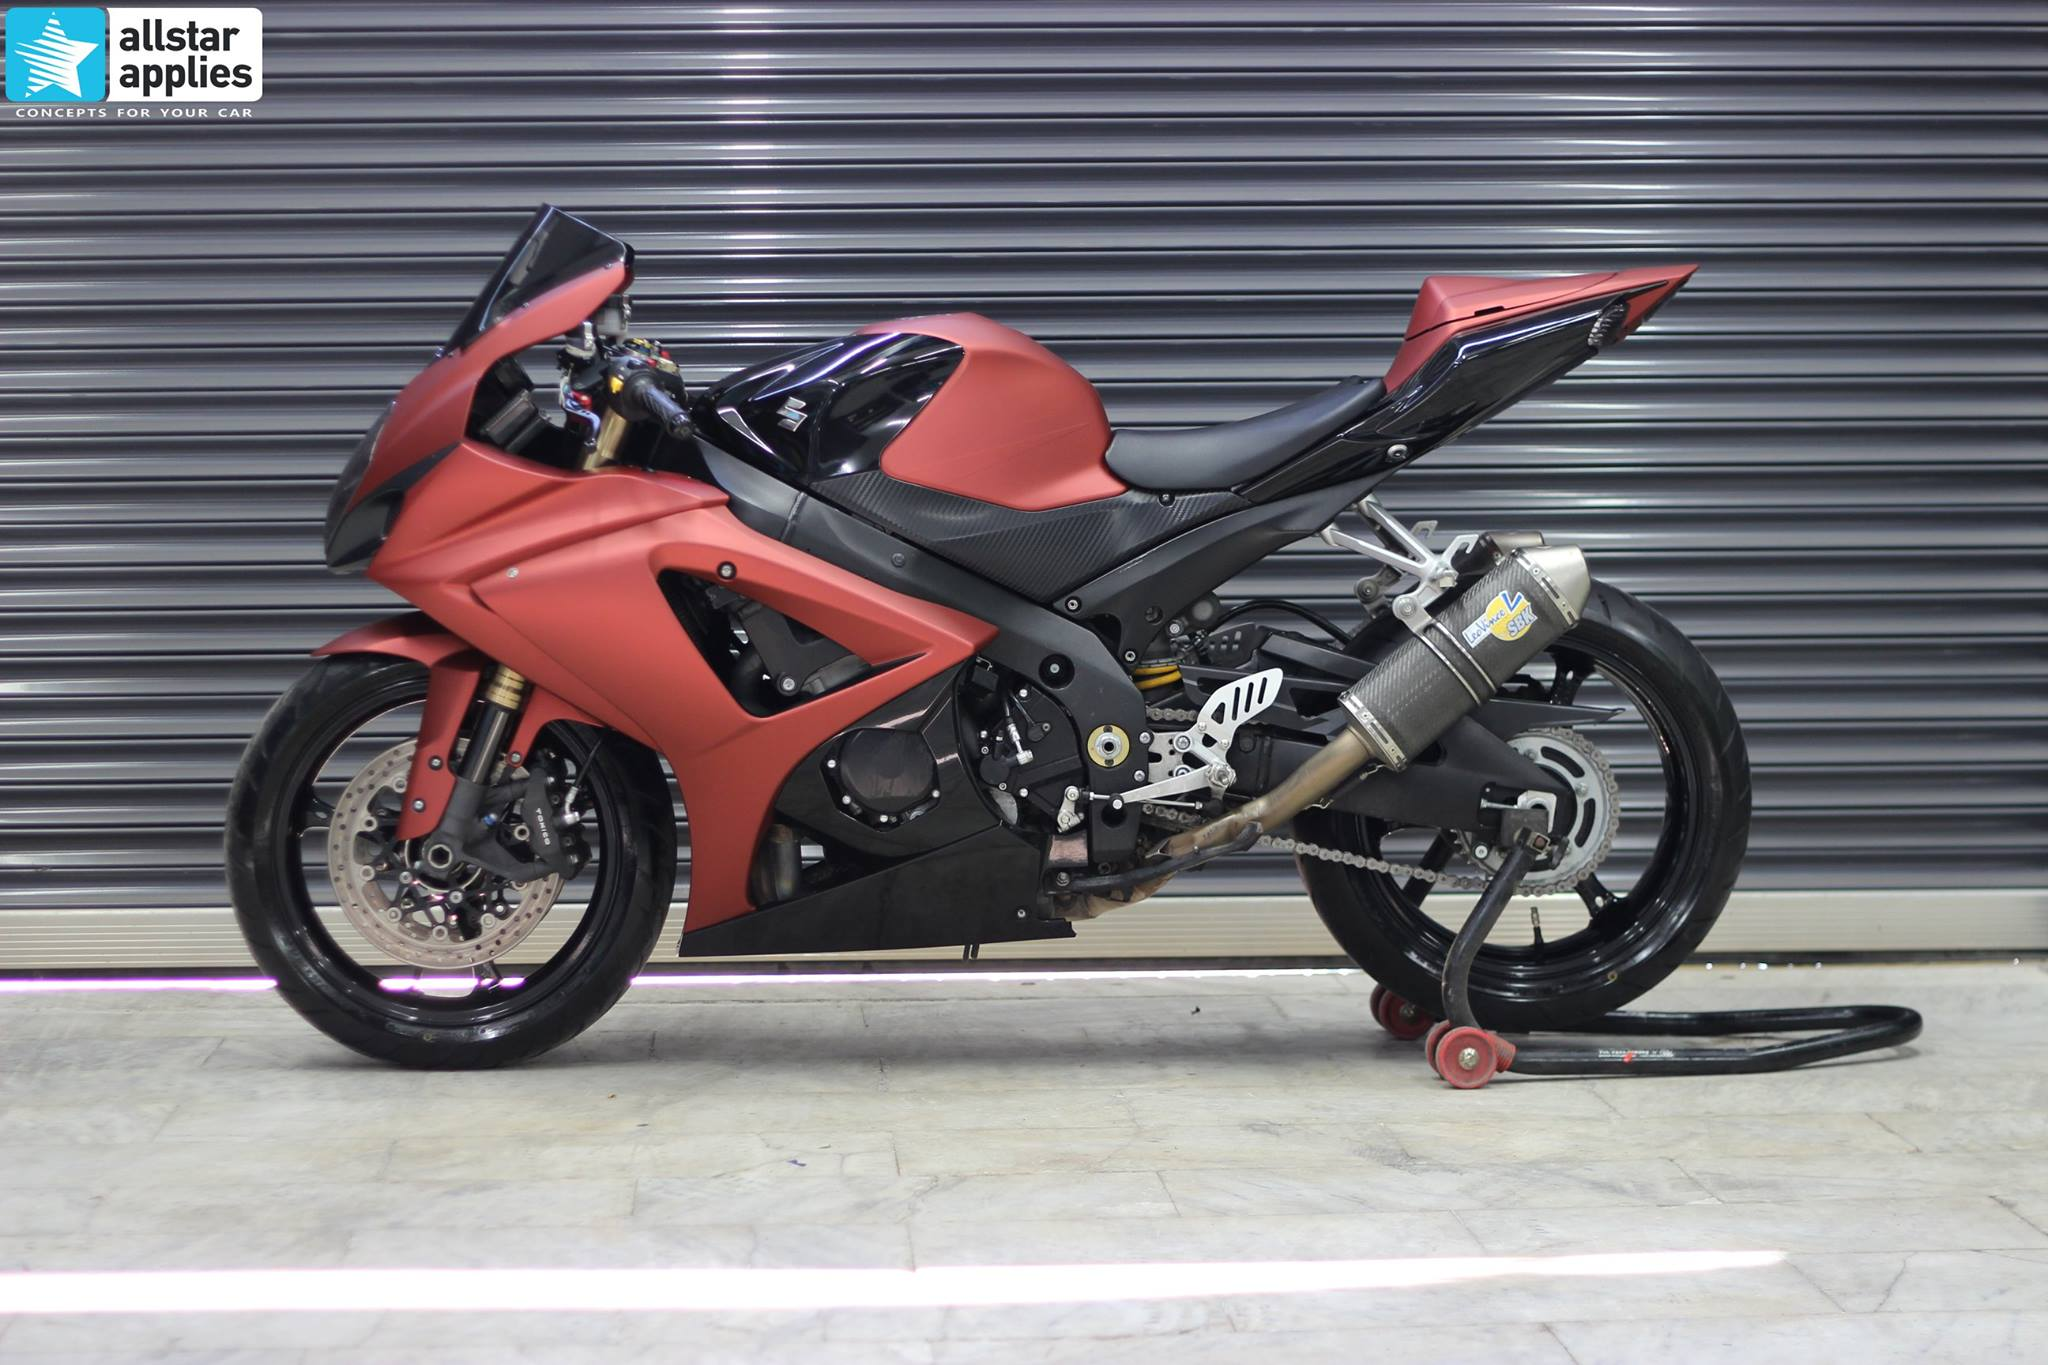 GSXR 1000 - Red Aluminium Matte + Black Gloss (1)